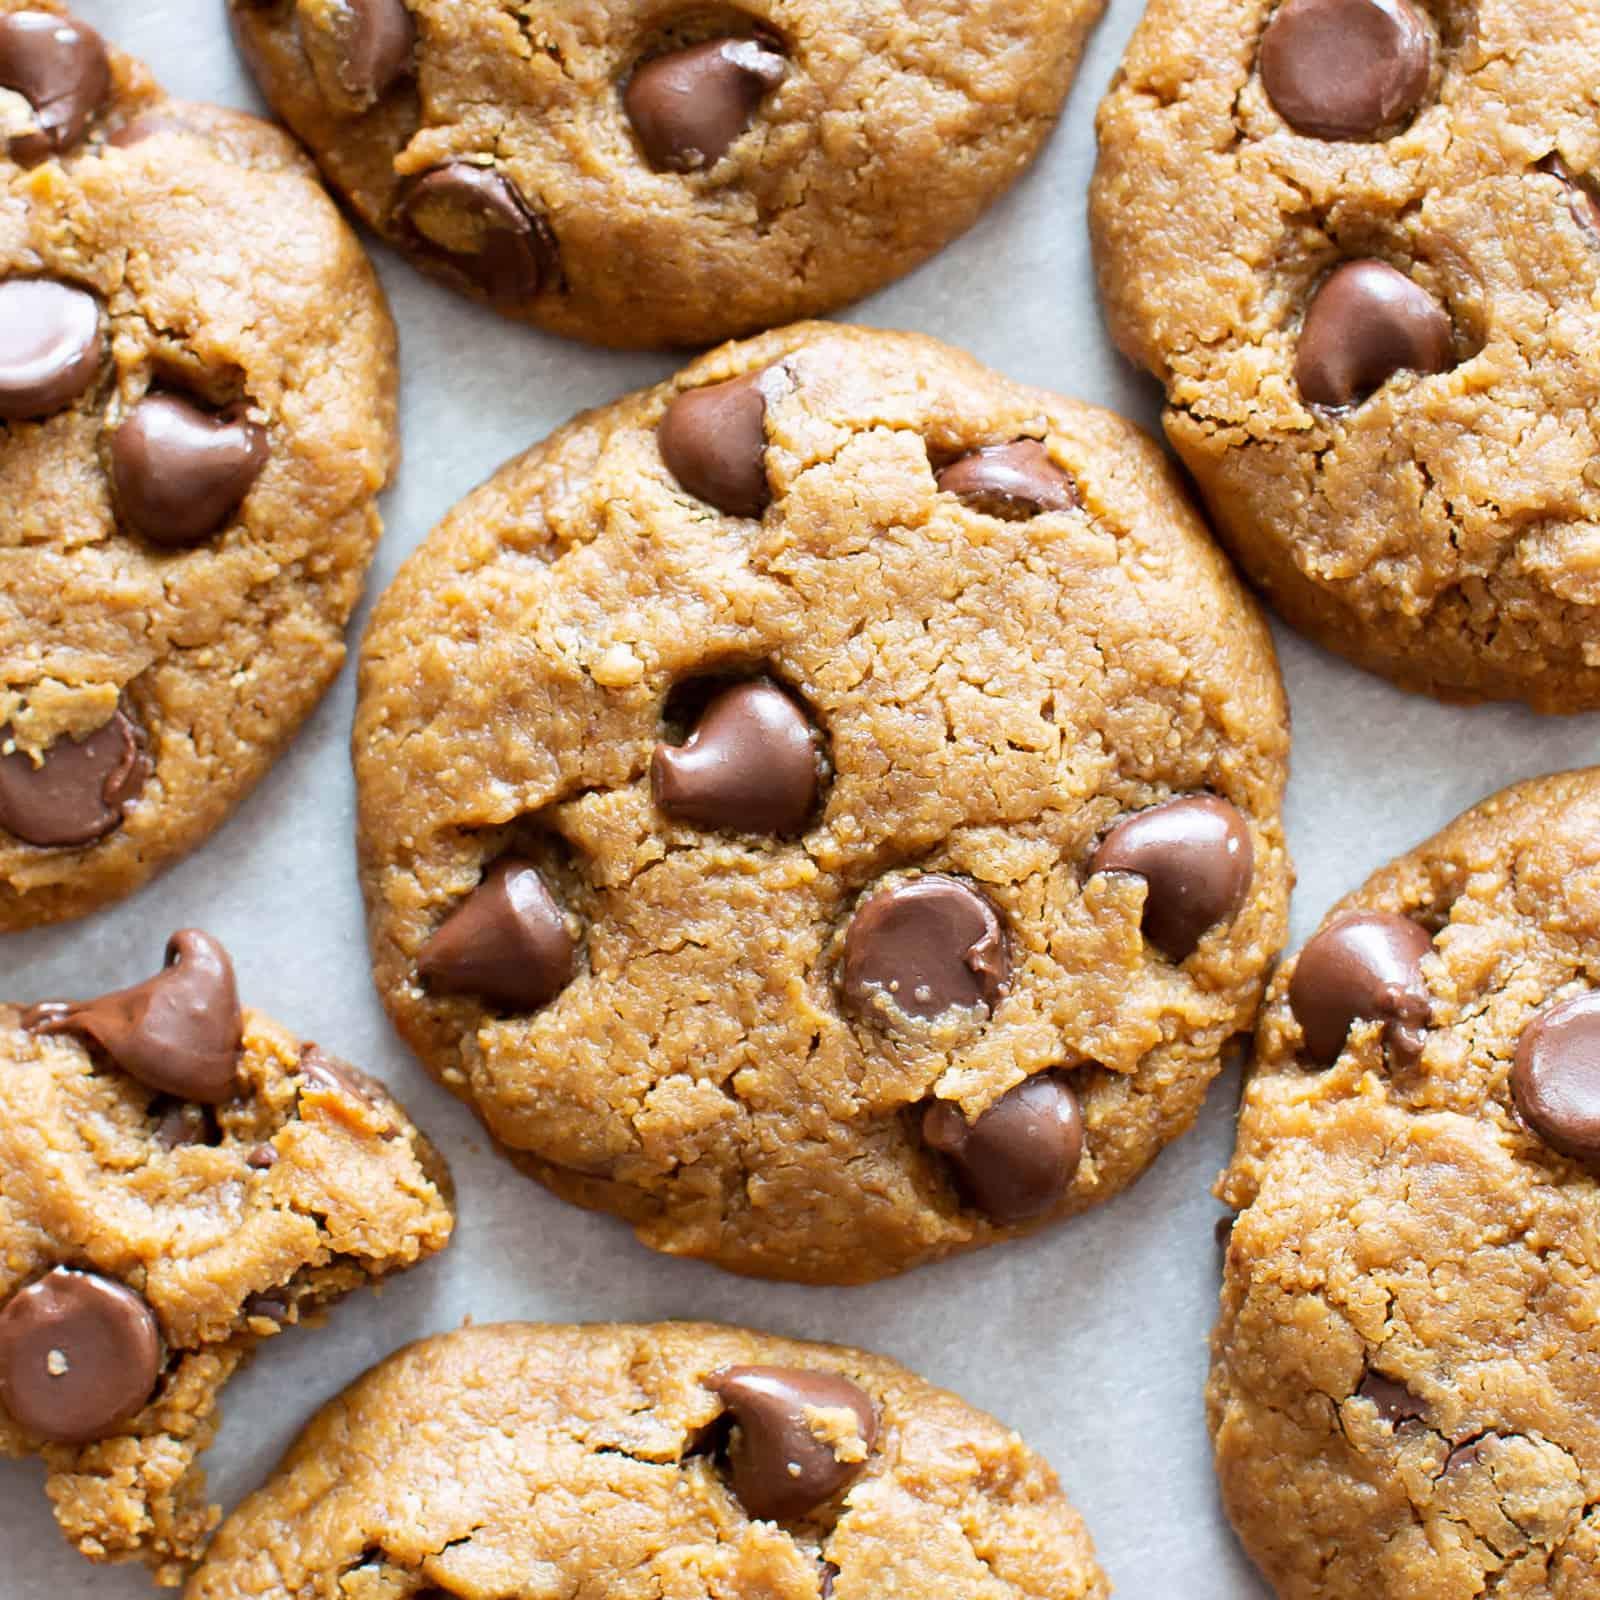 Chocolate Chip Homemade Cashew Butter Cookies Recipe